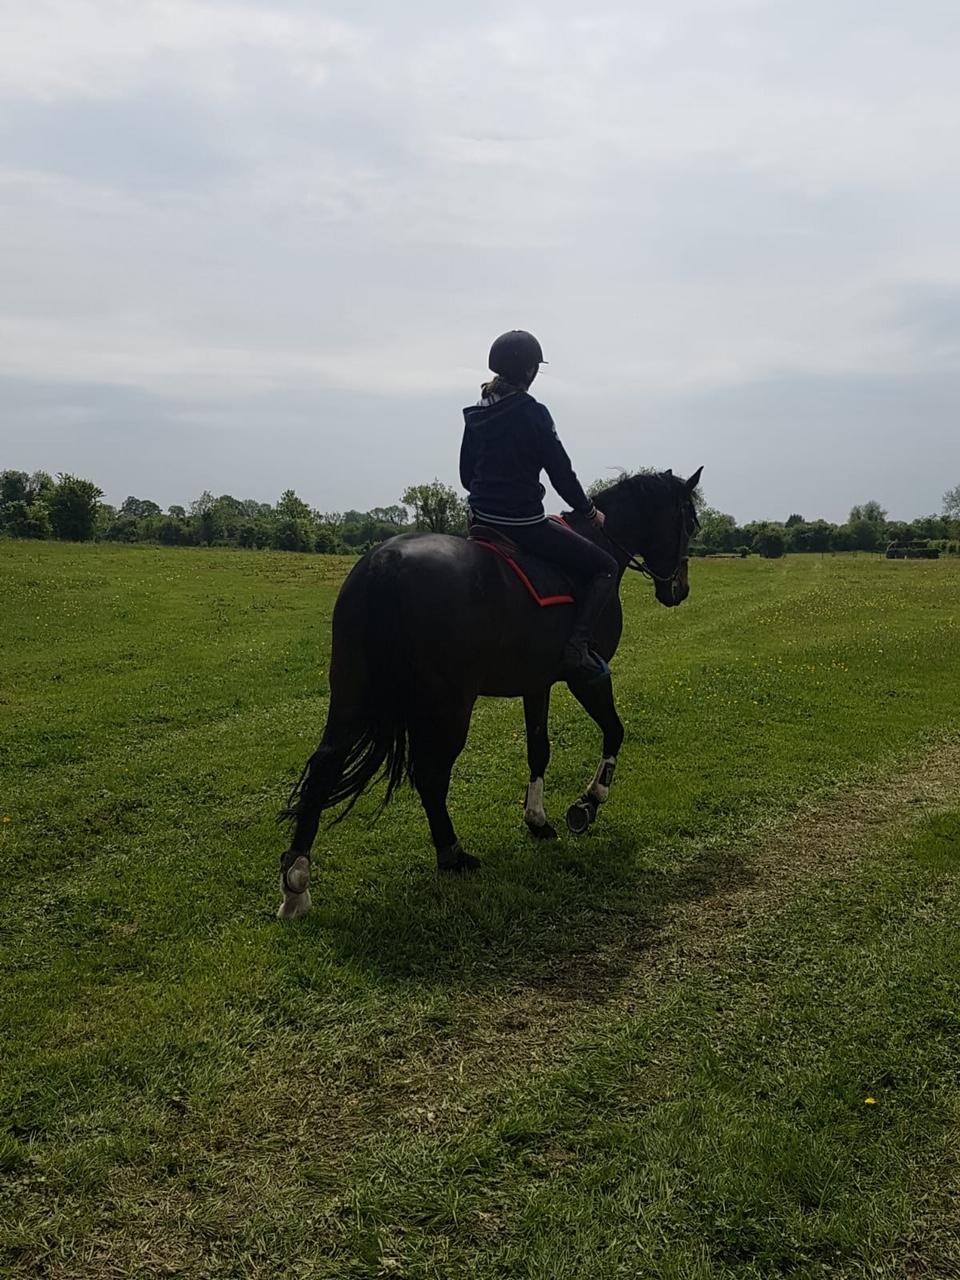 Collistown equestrian centre